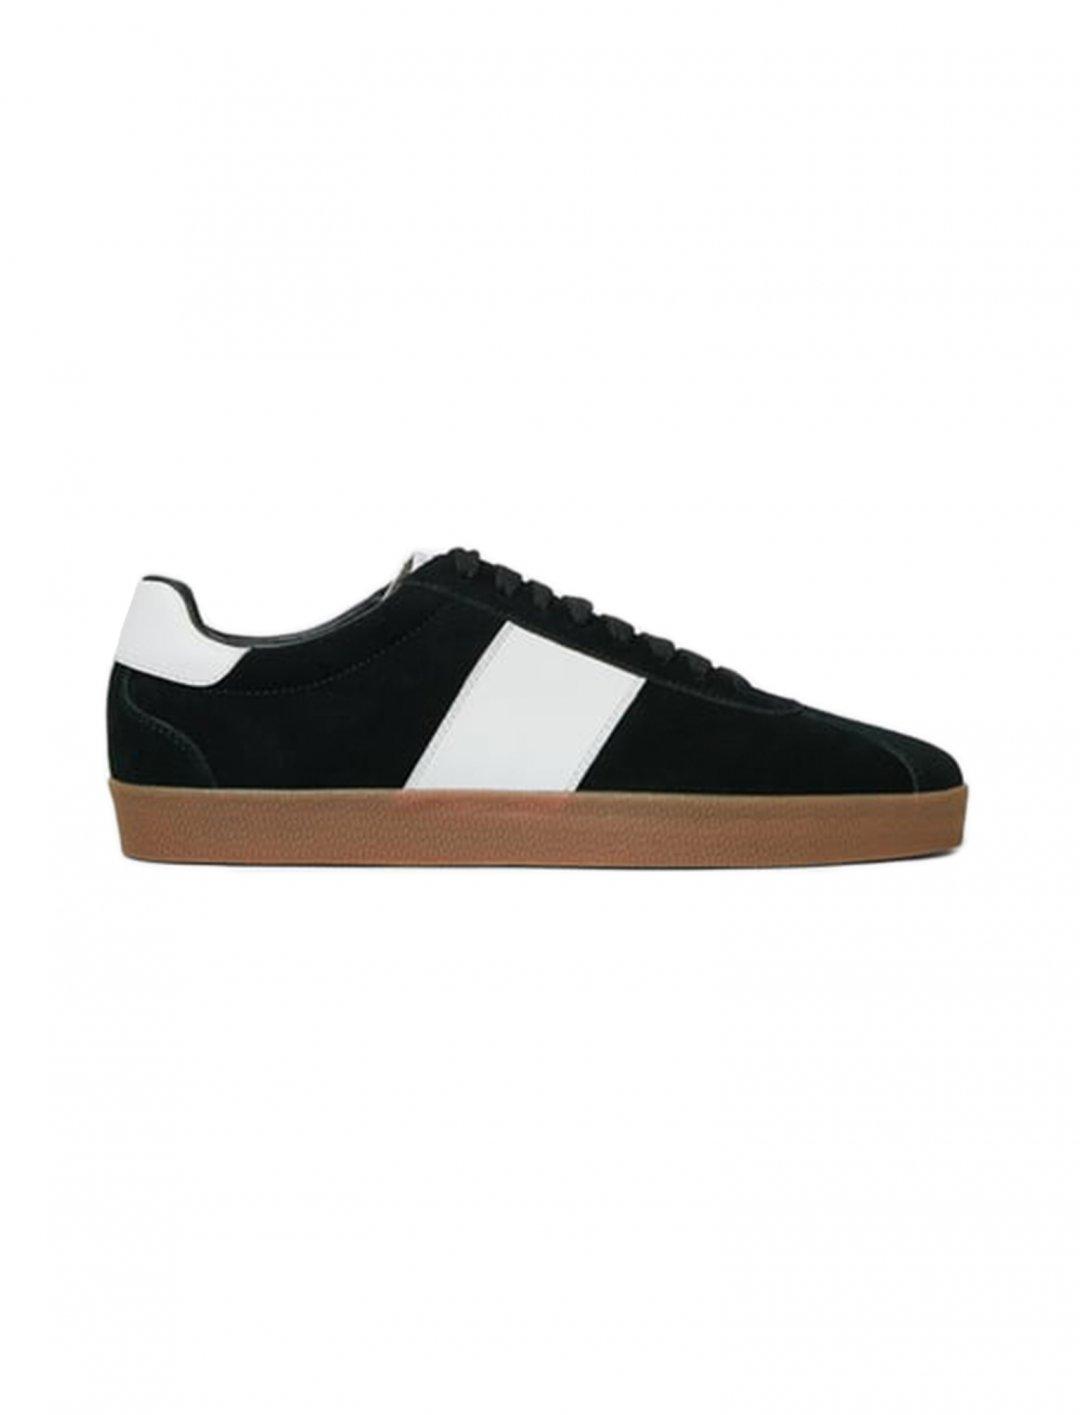 "Mikolas Josef's Plimsolls {""id"":12,""product_section_id"":1,""name"":""Shoes"",""order"":12} Zara"